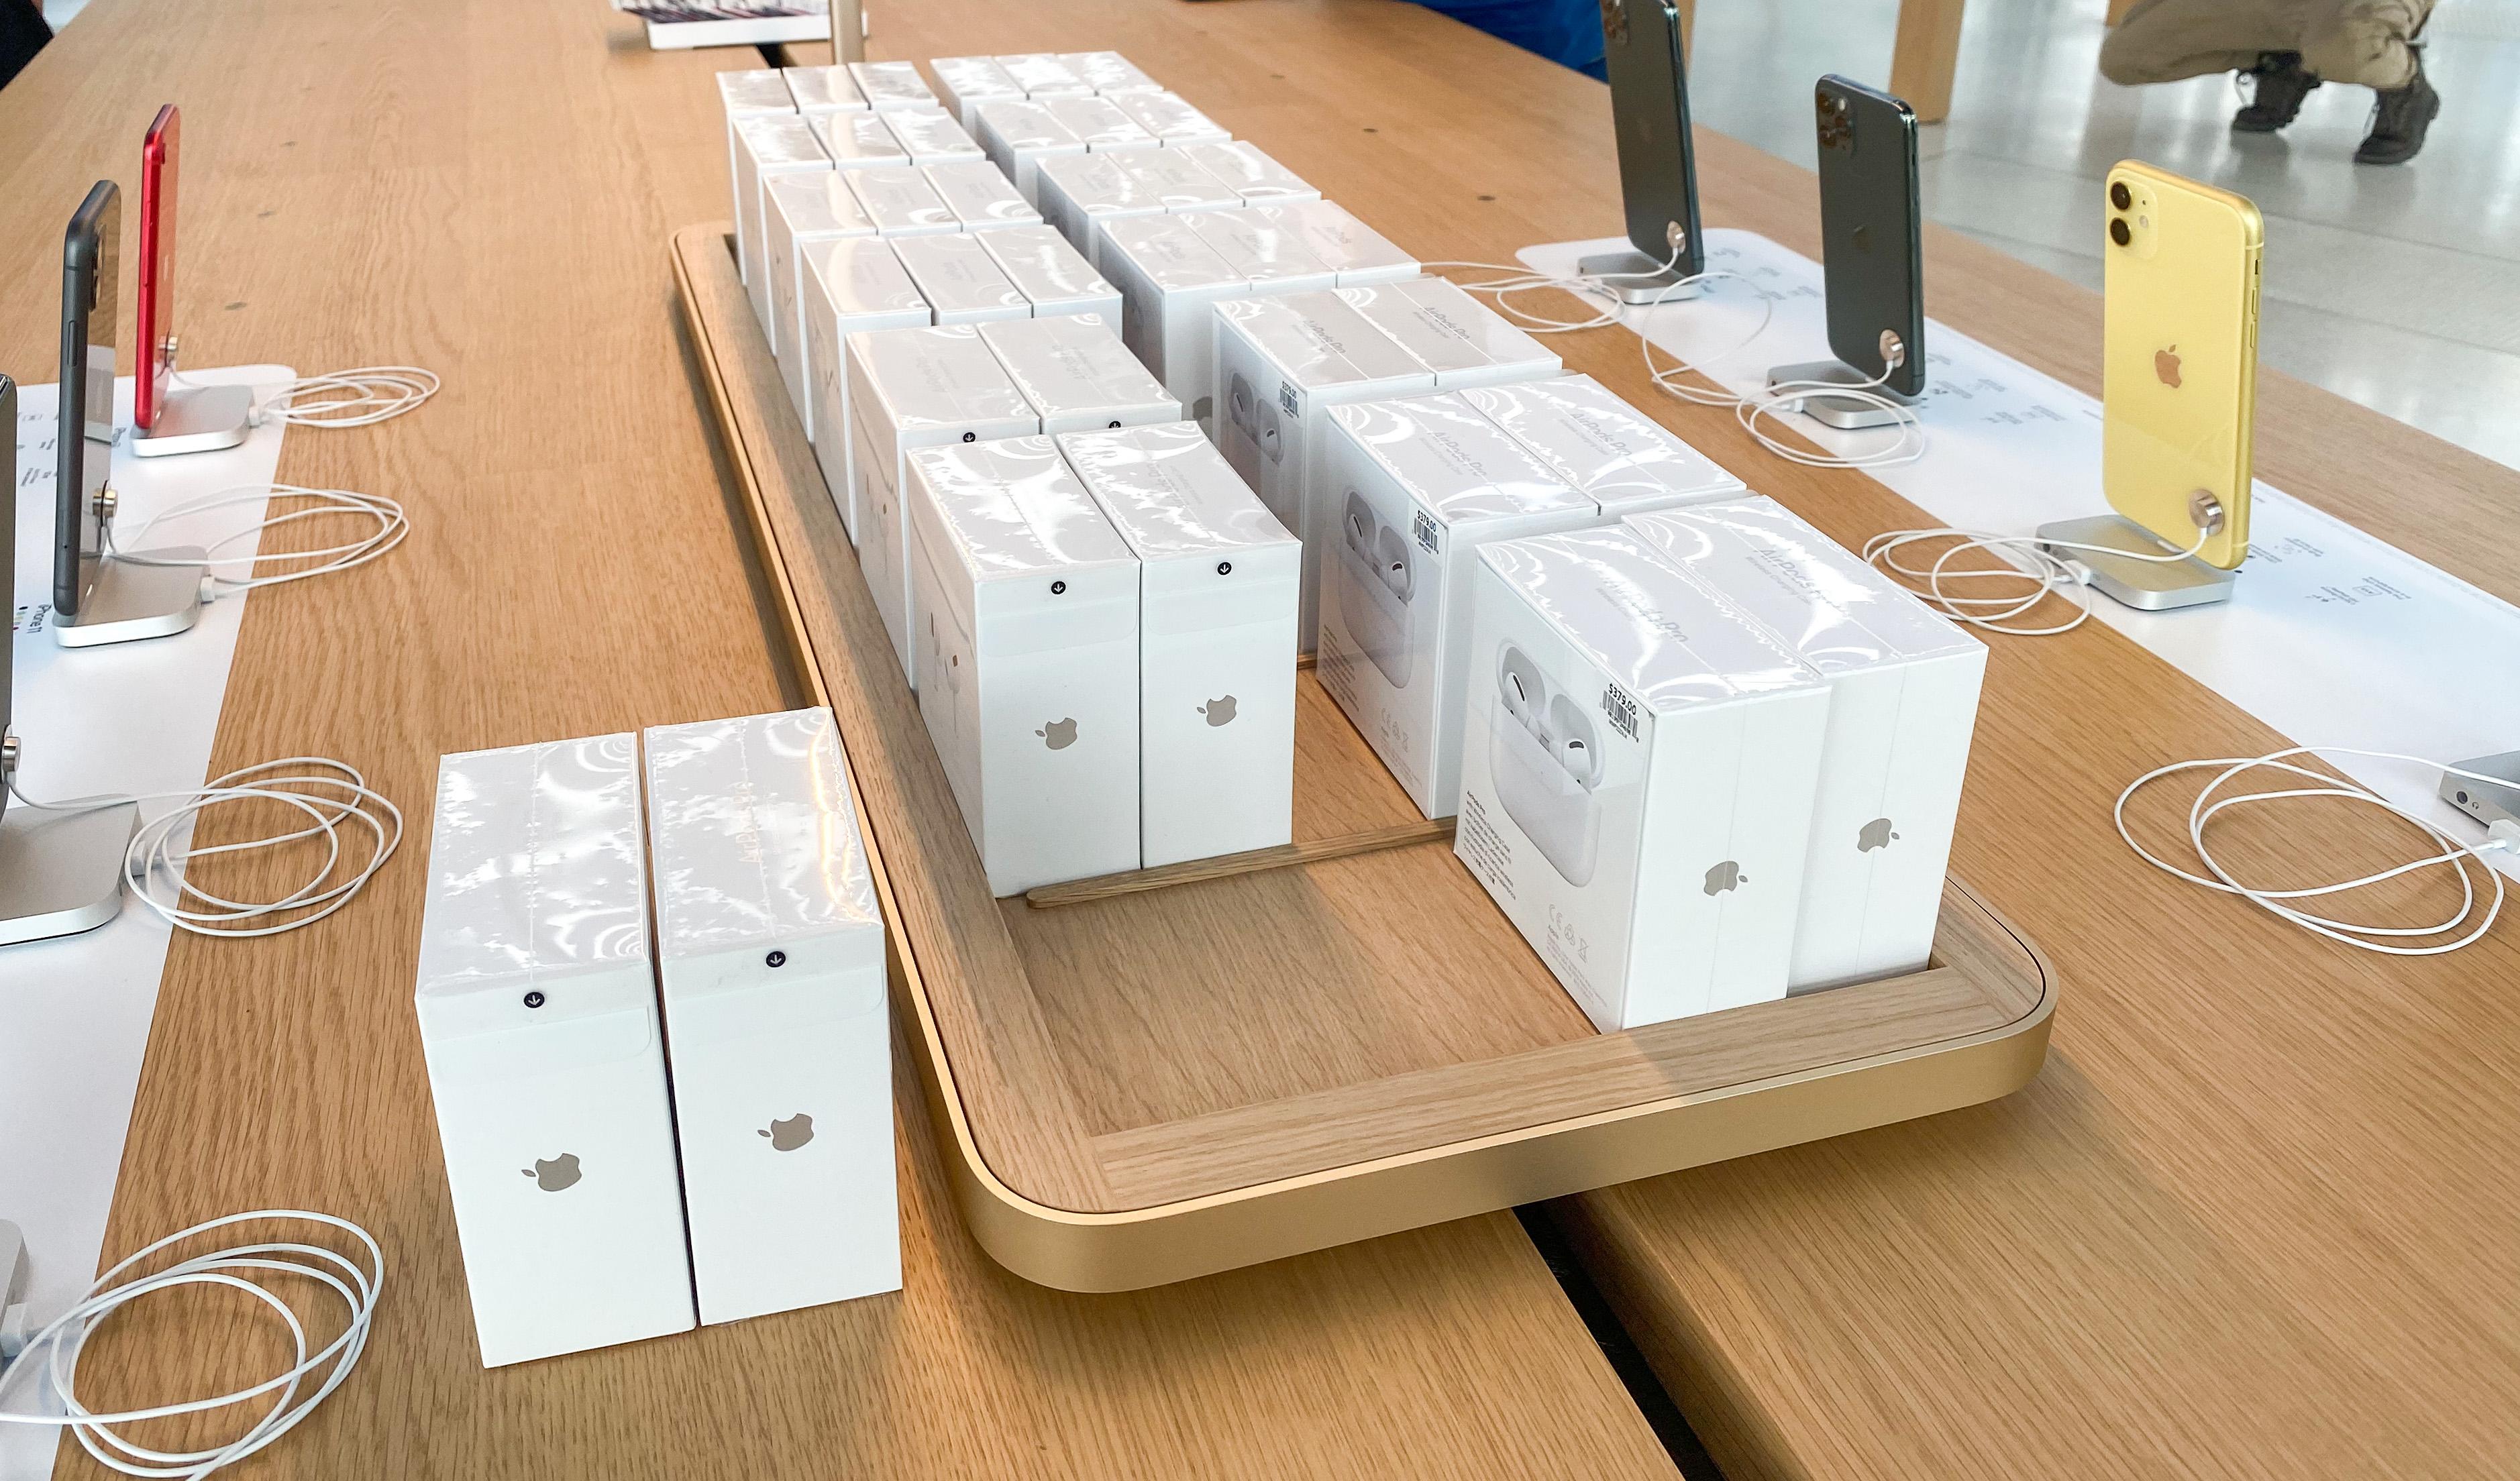 Apple mbs tray2